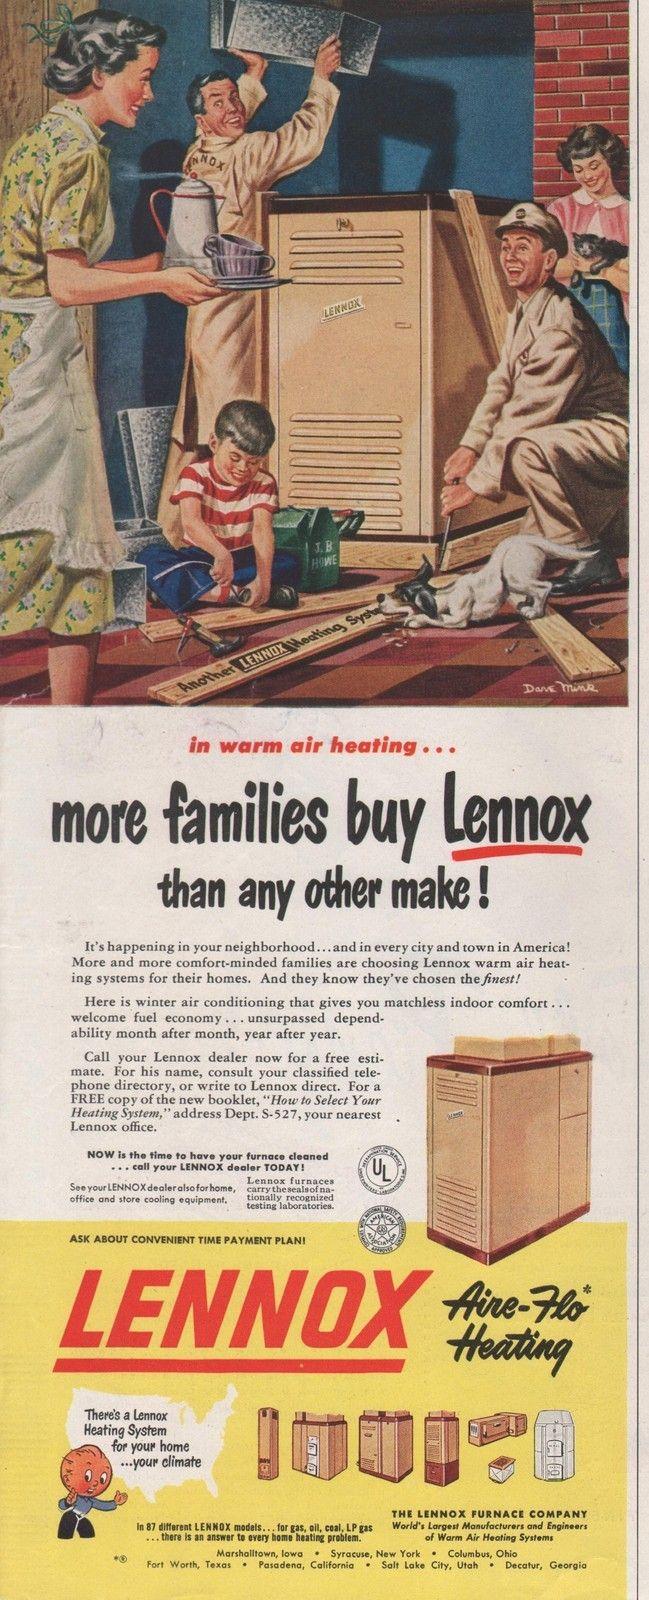 1950 Vintage Lennox Furance Aire Flo Heating More Families